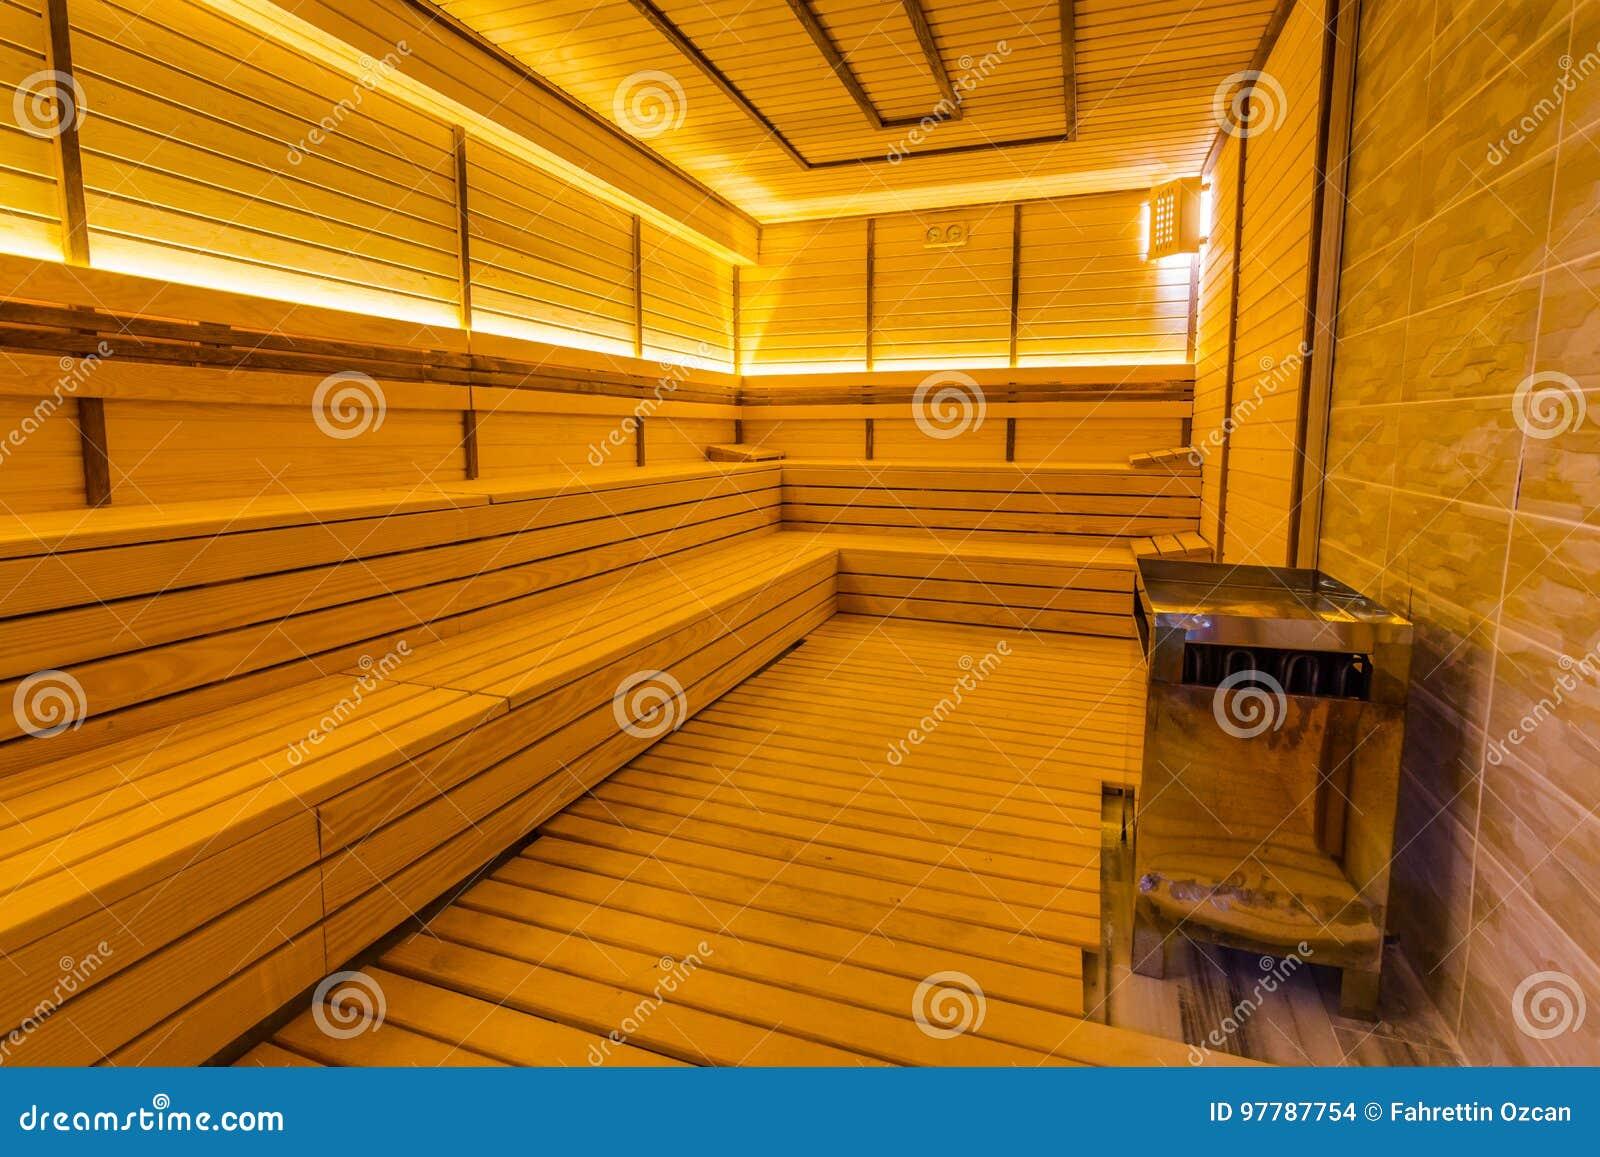 Interior of a wooden finnish sauna.